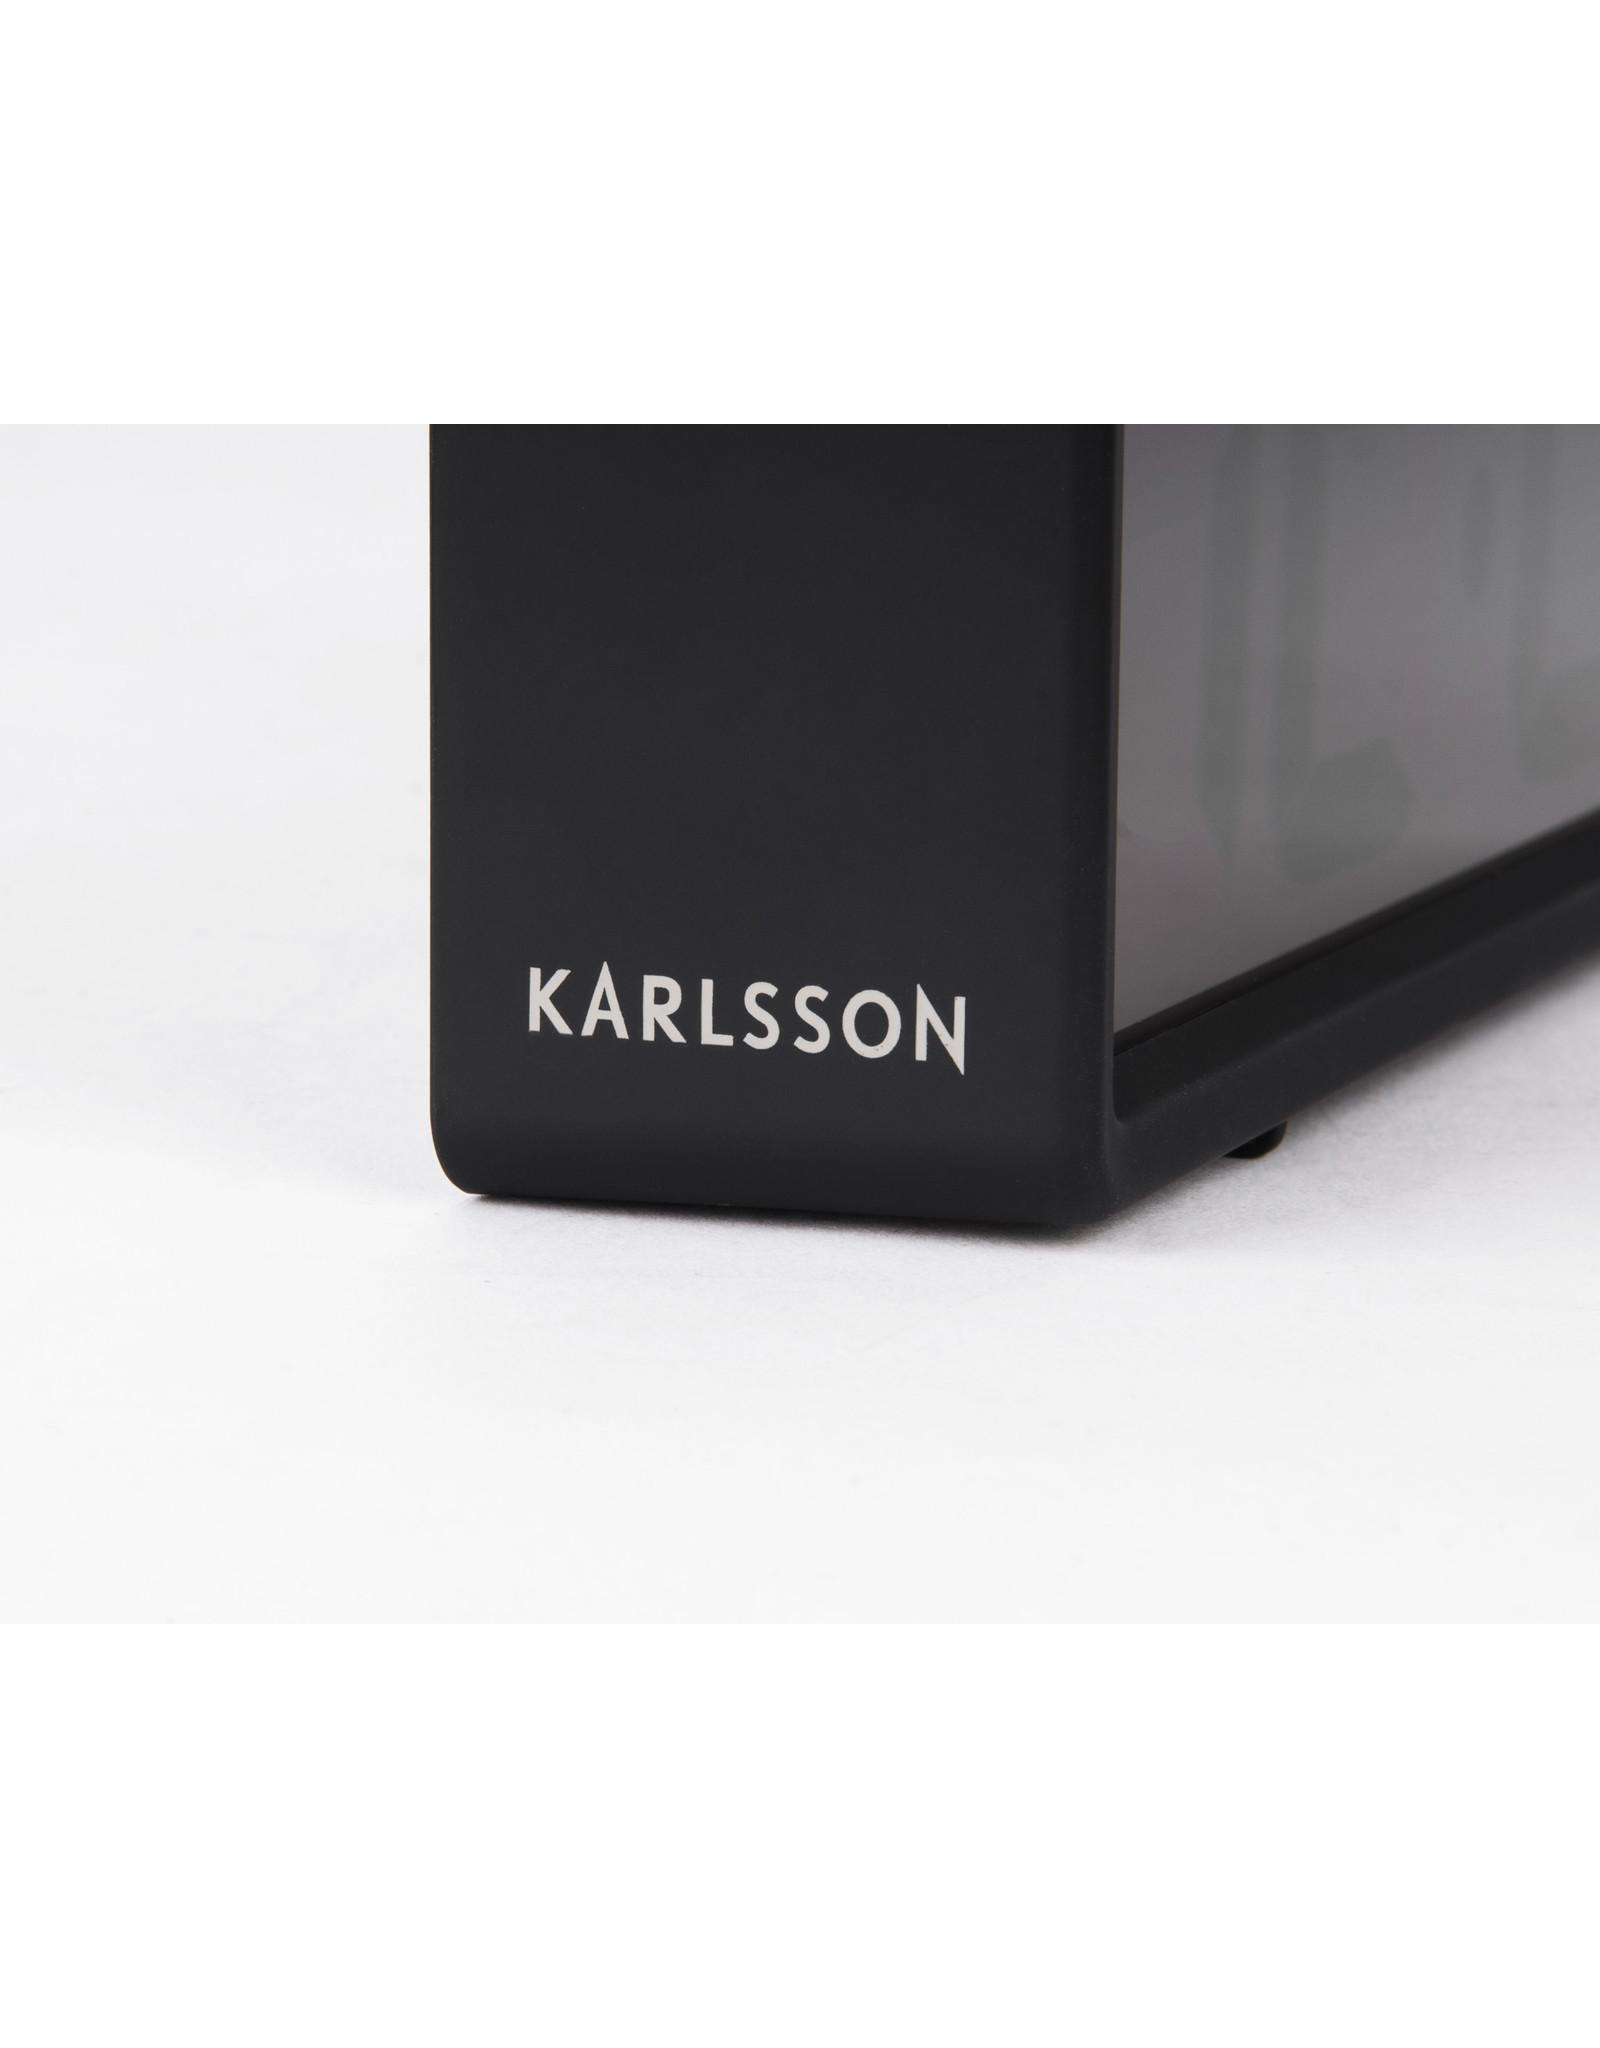 Karlsson alarm clock - coy (black)